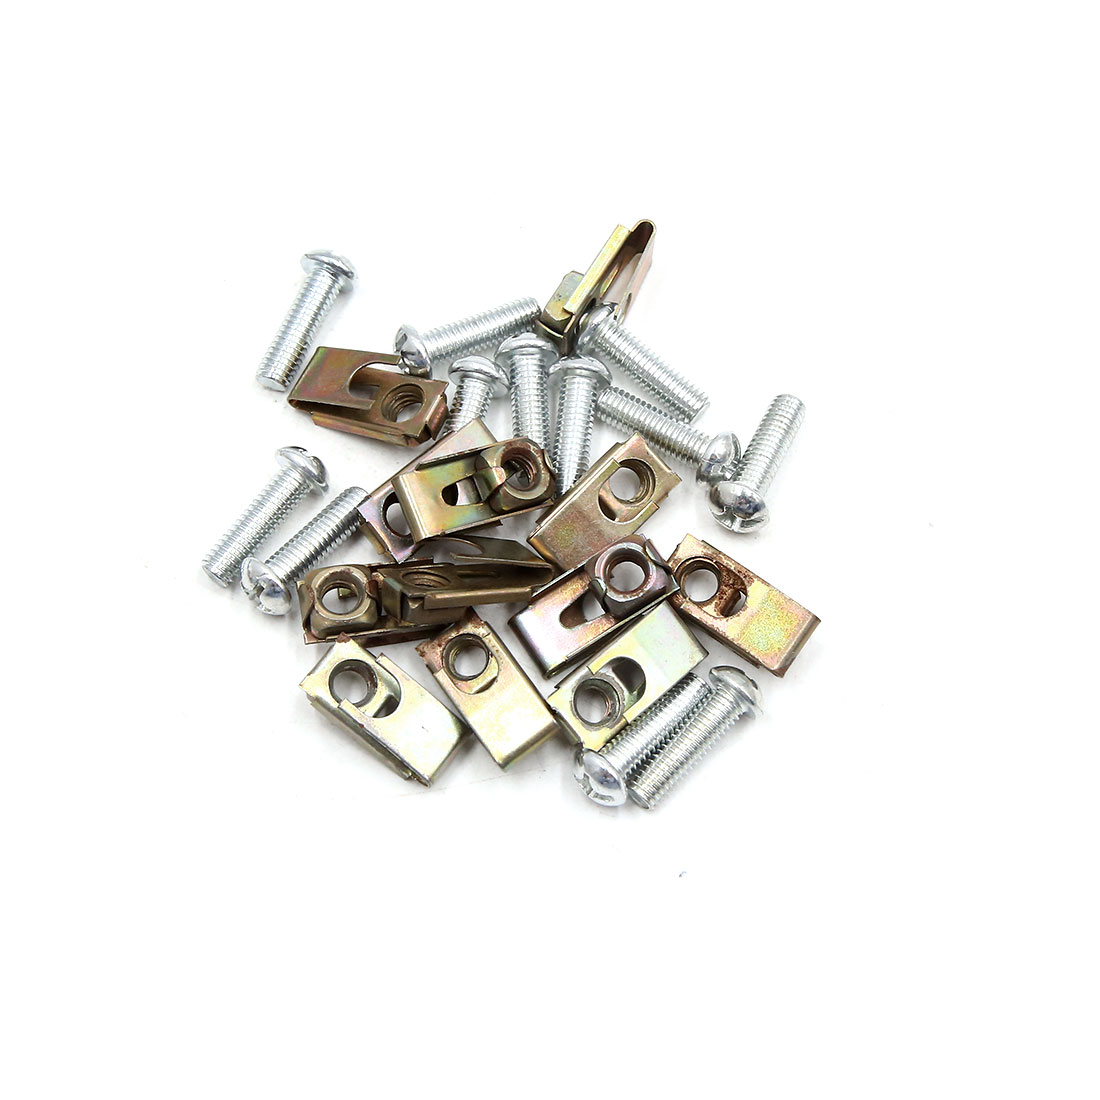 12PCS 6mm Thread Dia Car License Plate Fairing Fastener Fixing Clips Kit w Screw